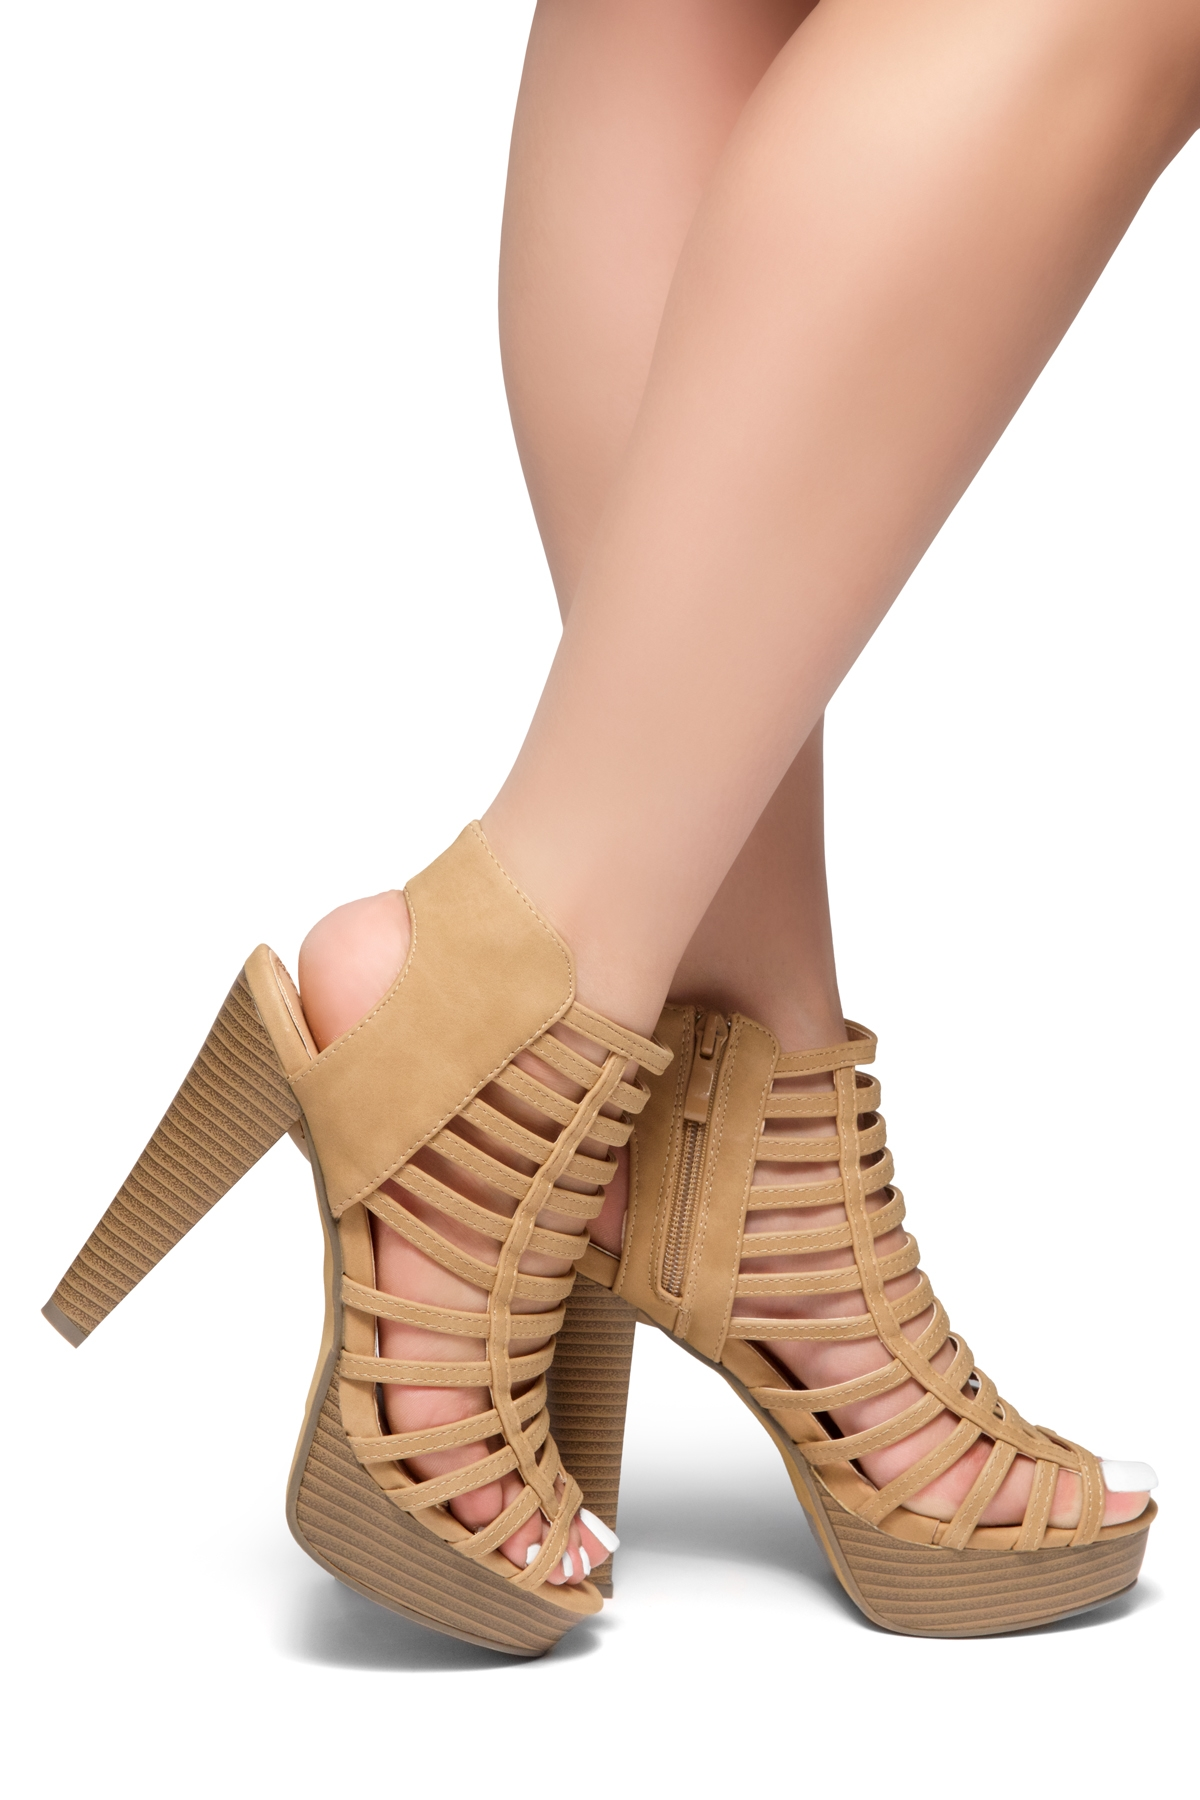 7c411c2b70c HerStyle Elevate Me-Peep Toe Chunky Platform Heel (Nude)